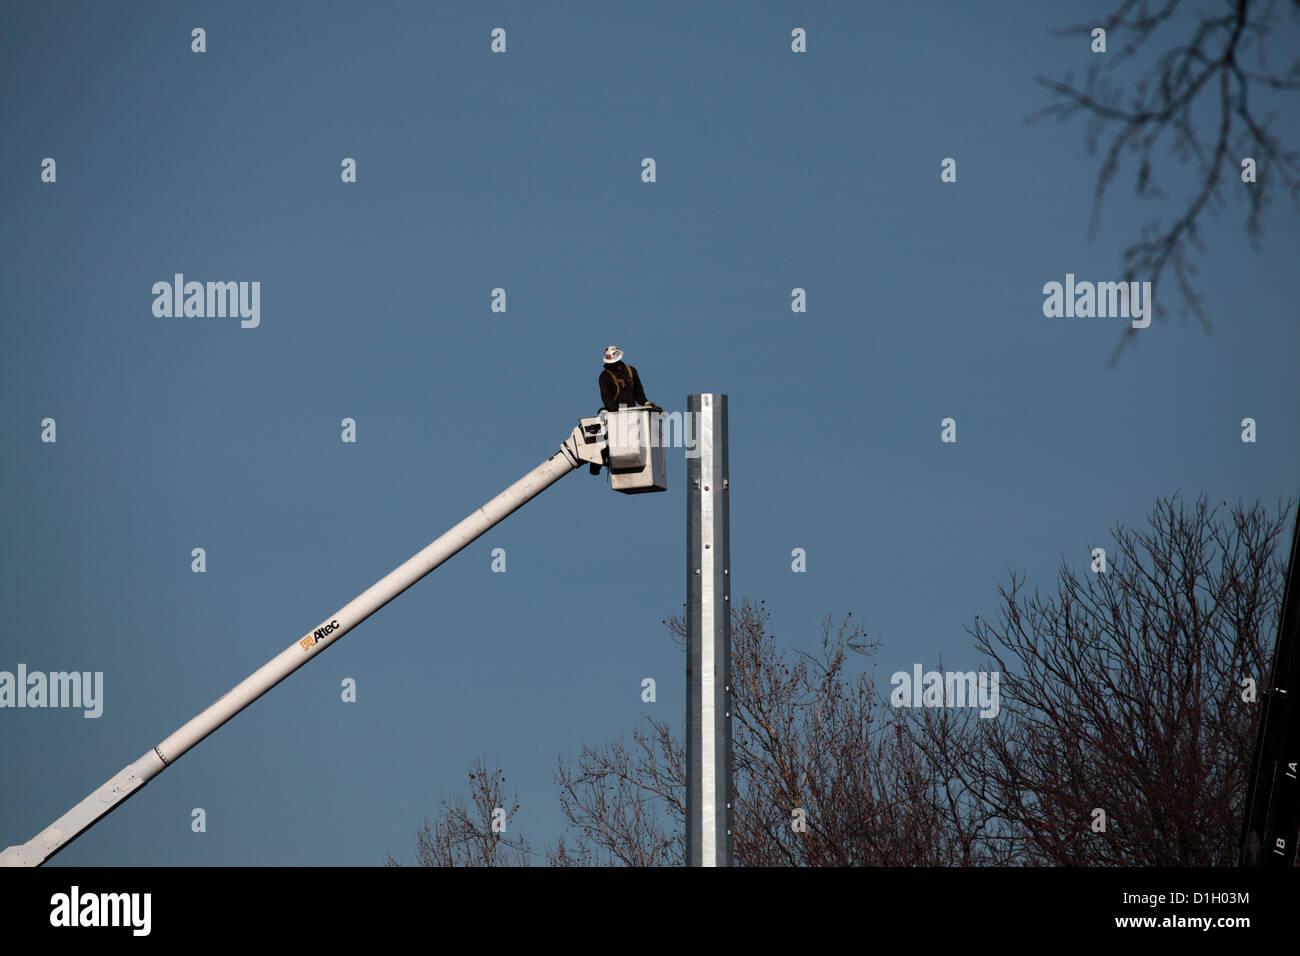 Man in bucket lift working on steel utility pole. - Stock Image